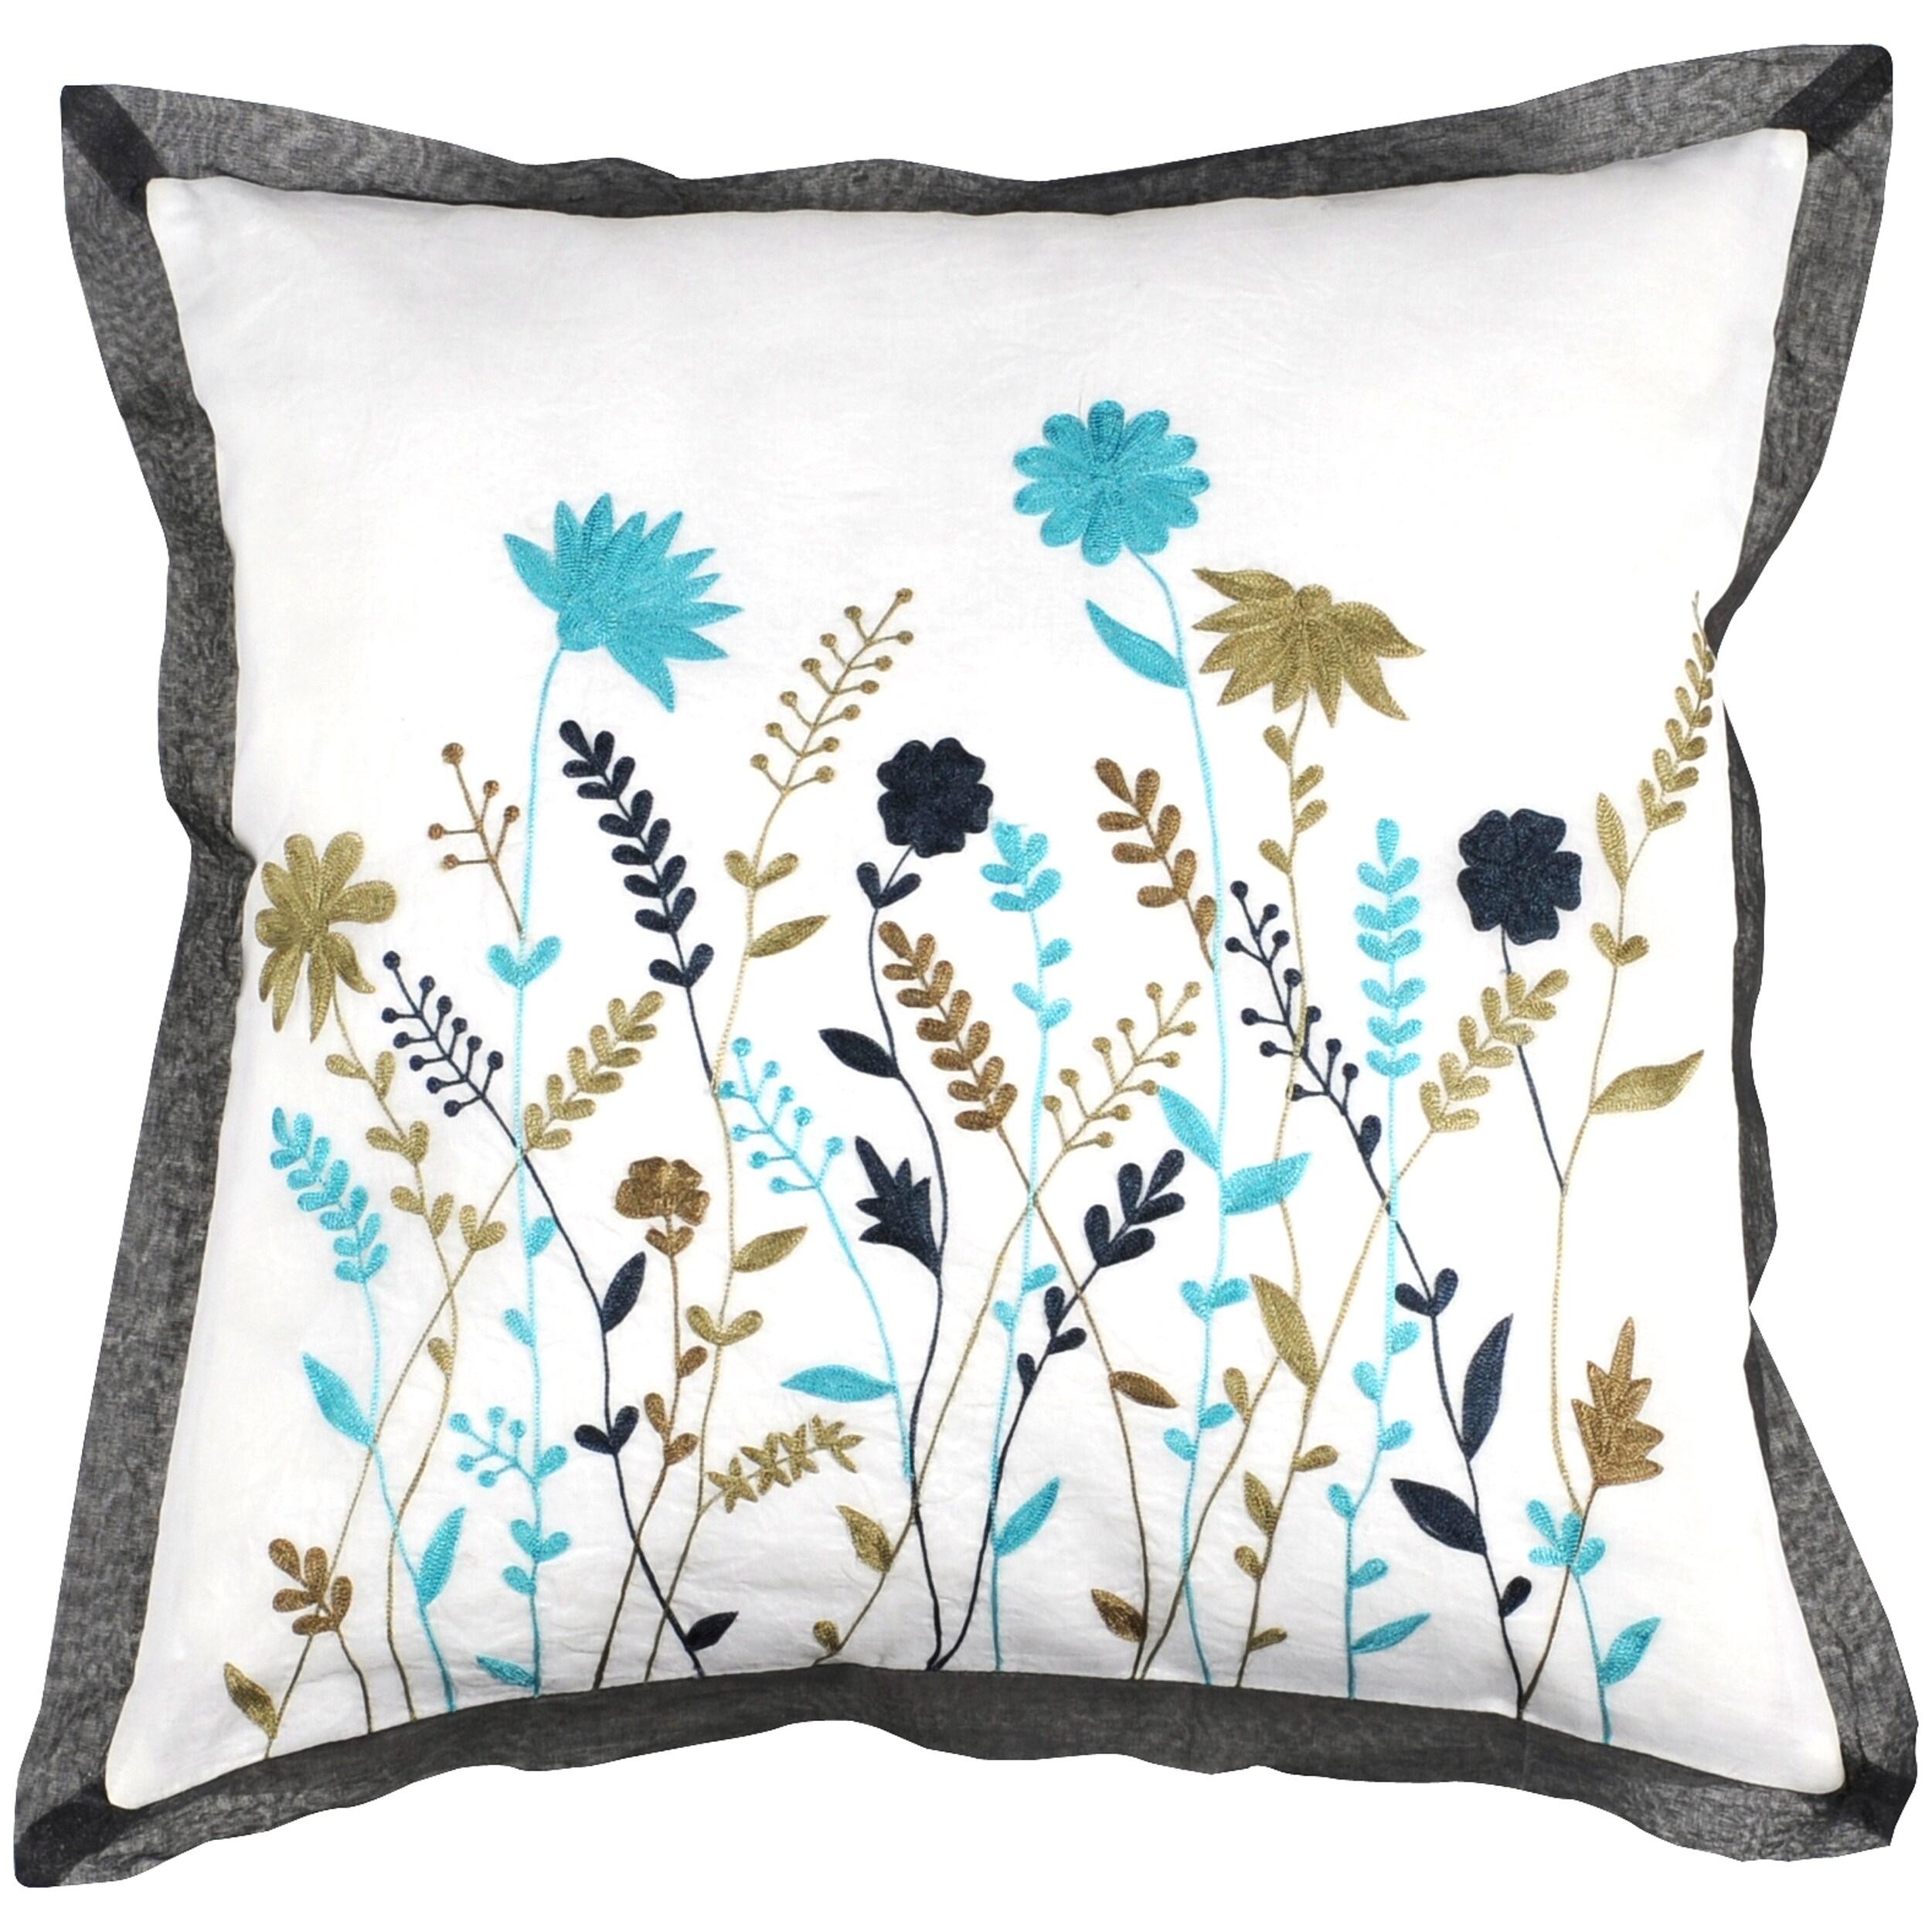 Decorative Quince 18x18 Pillow